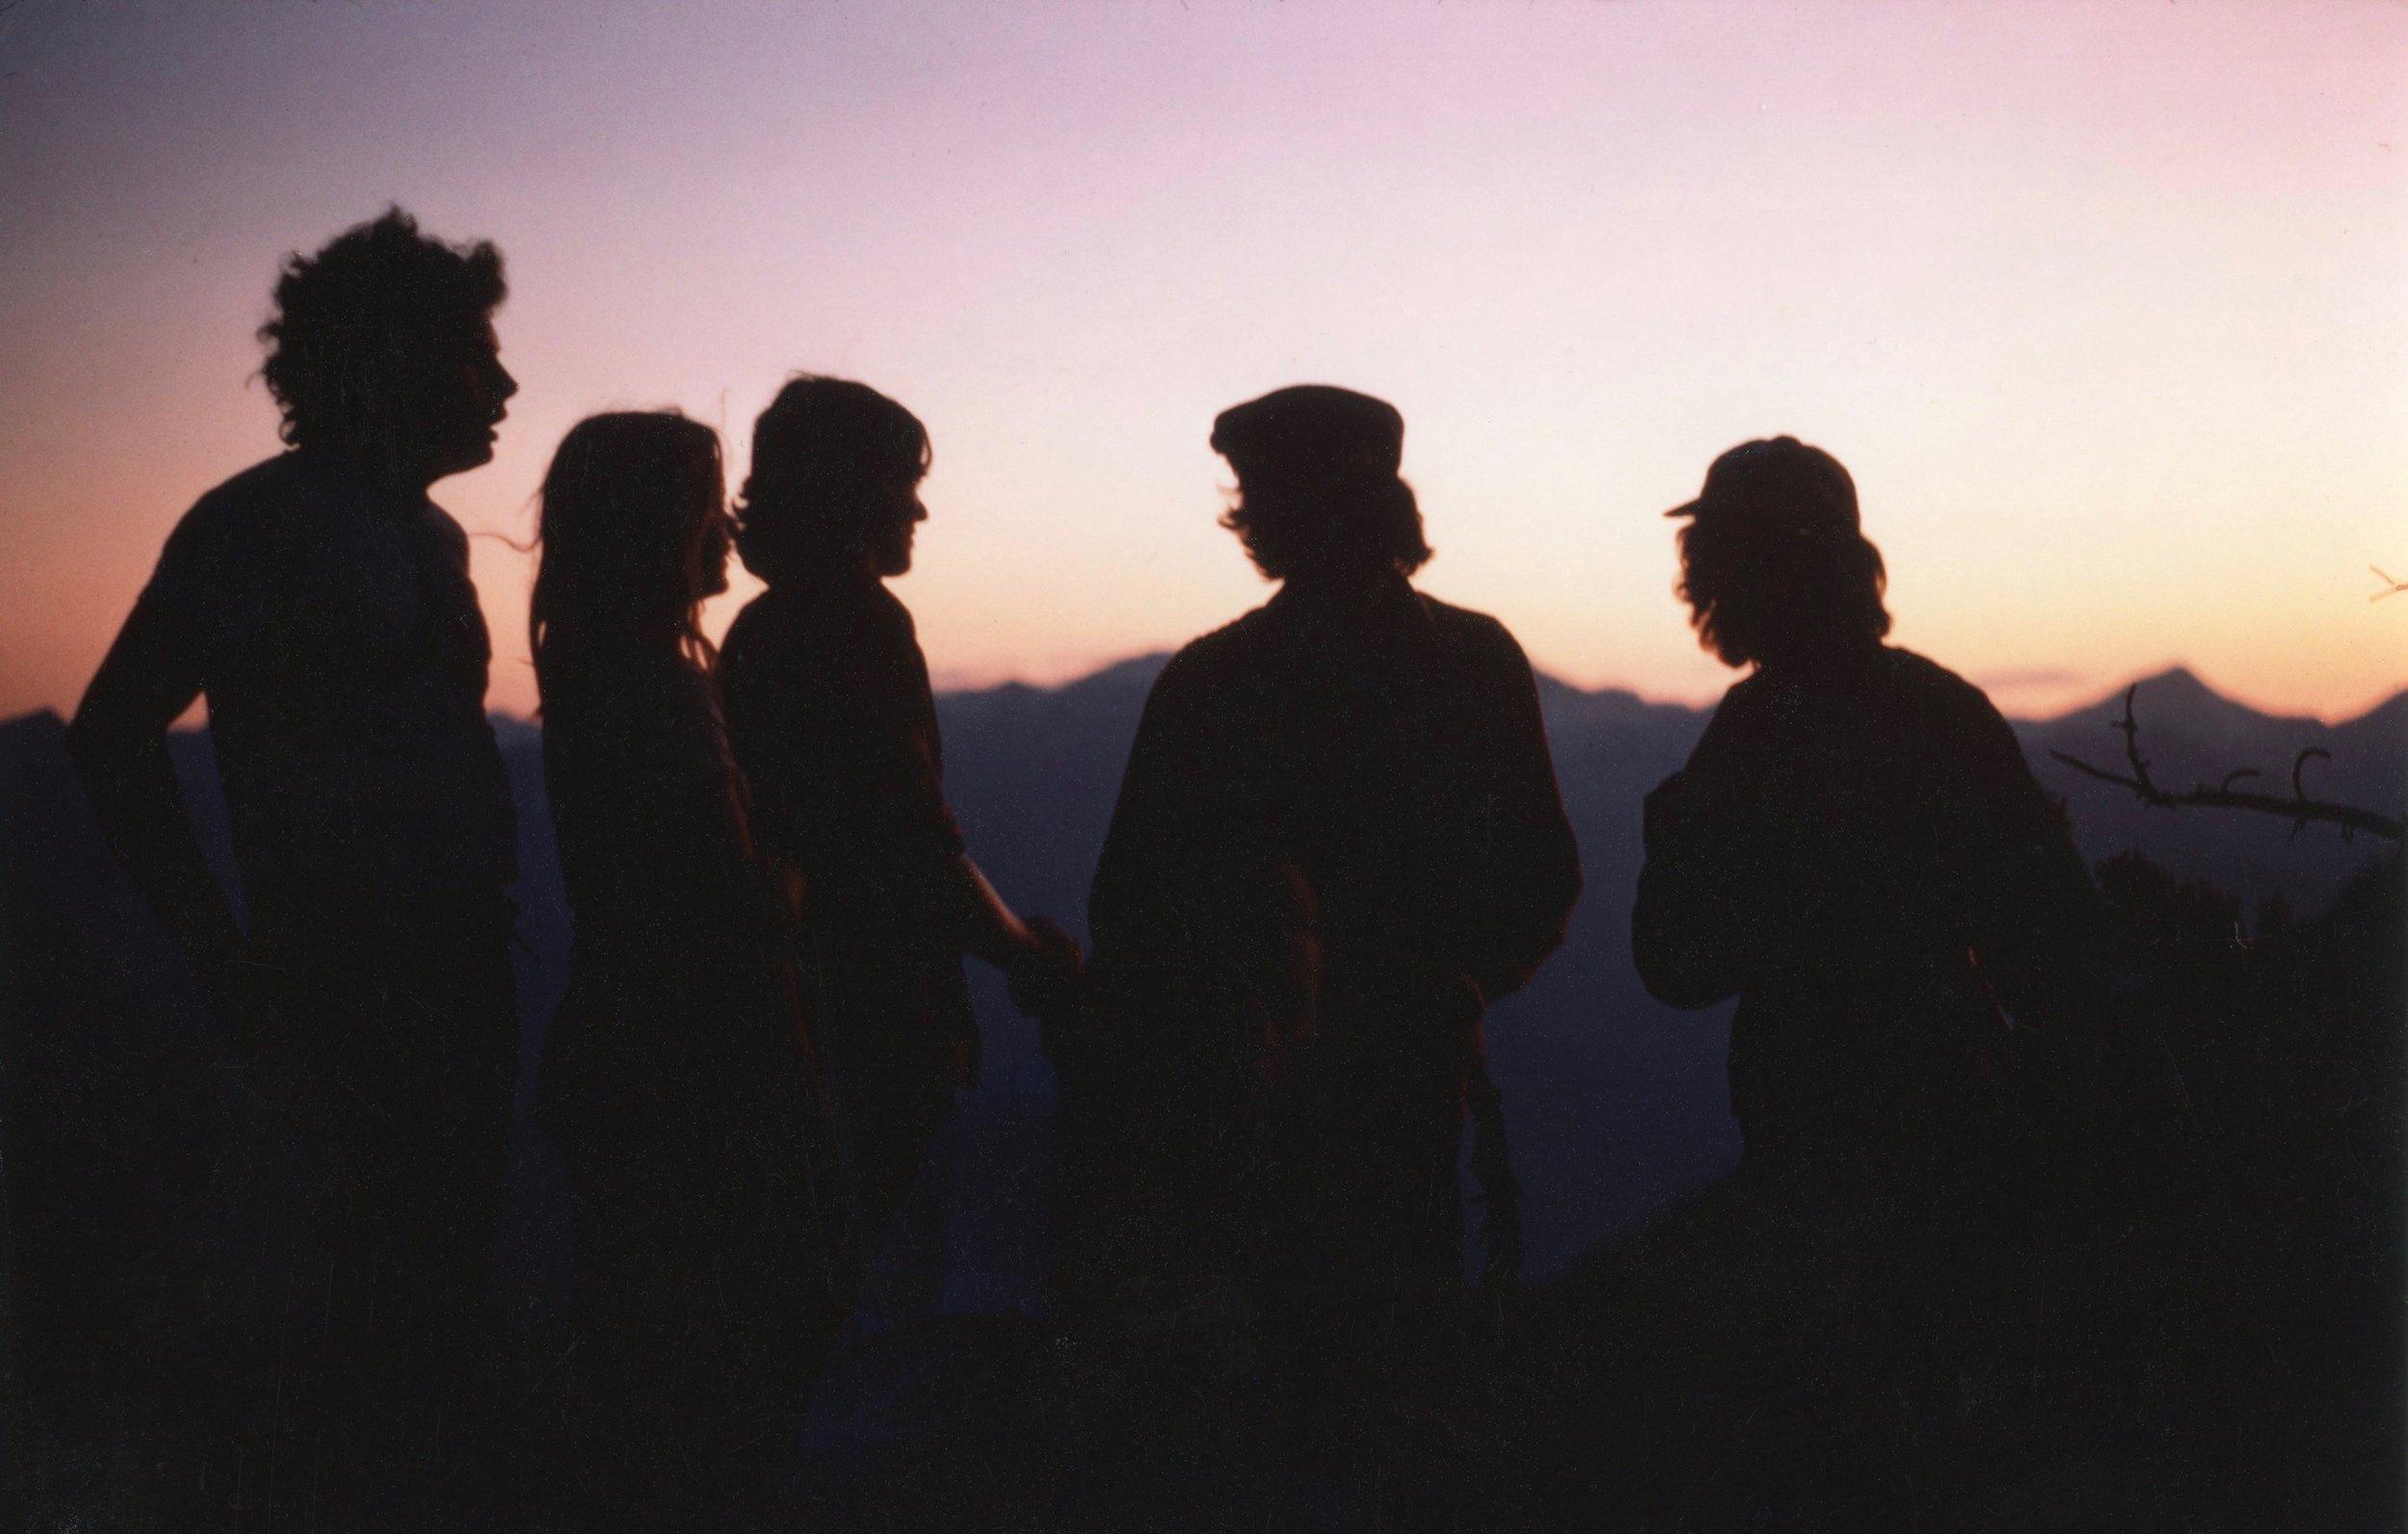 Huey, Carmen, Jute, Mike, and Scratch, at Idaho Peak